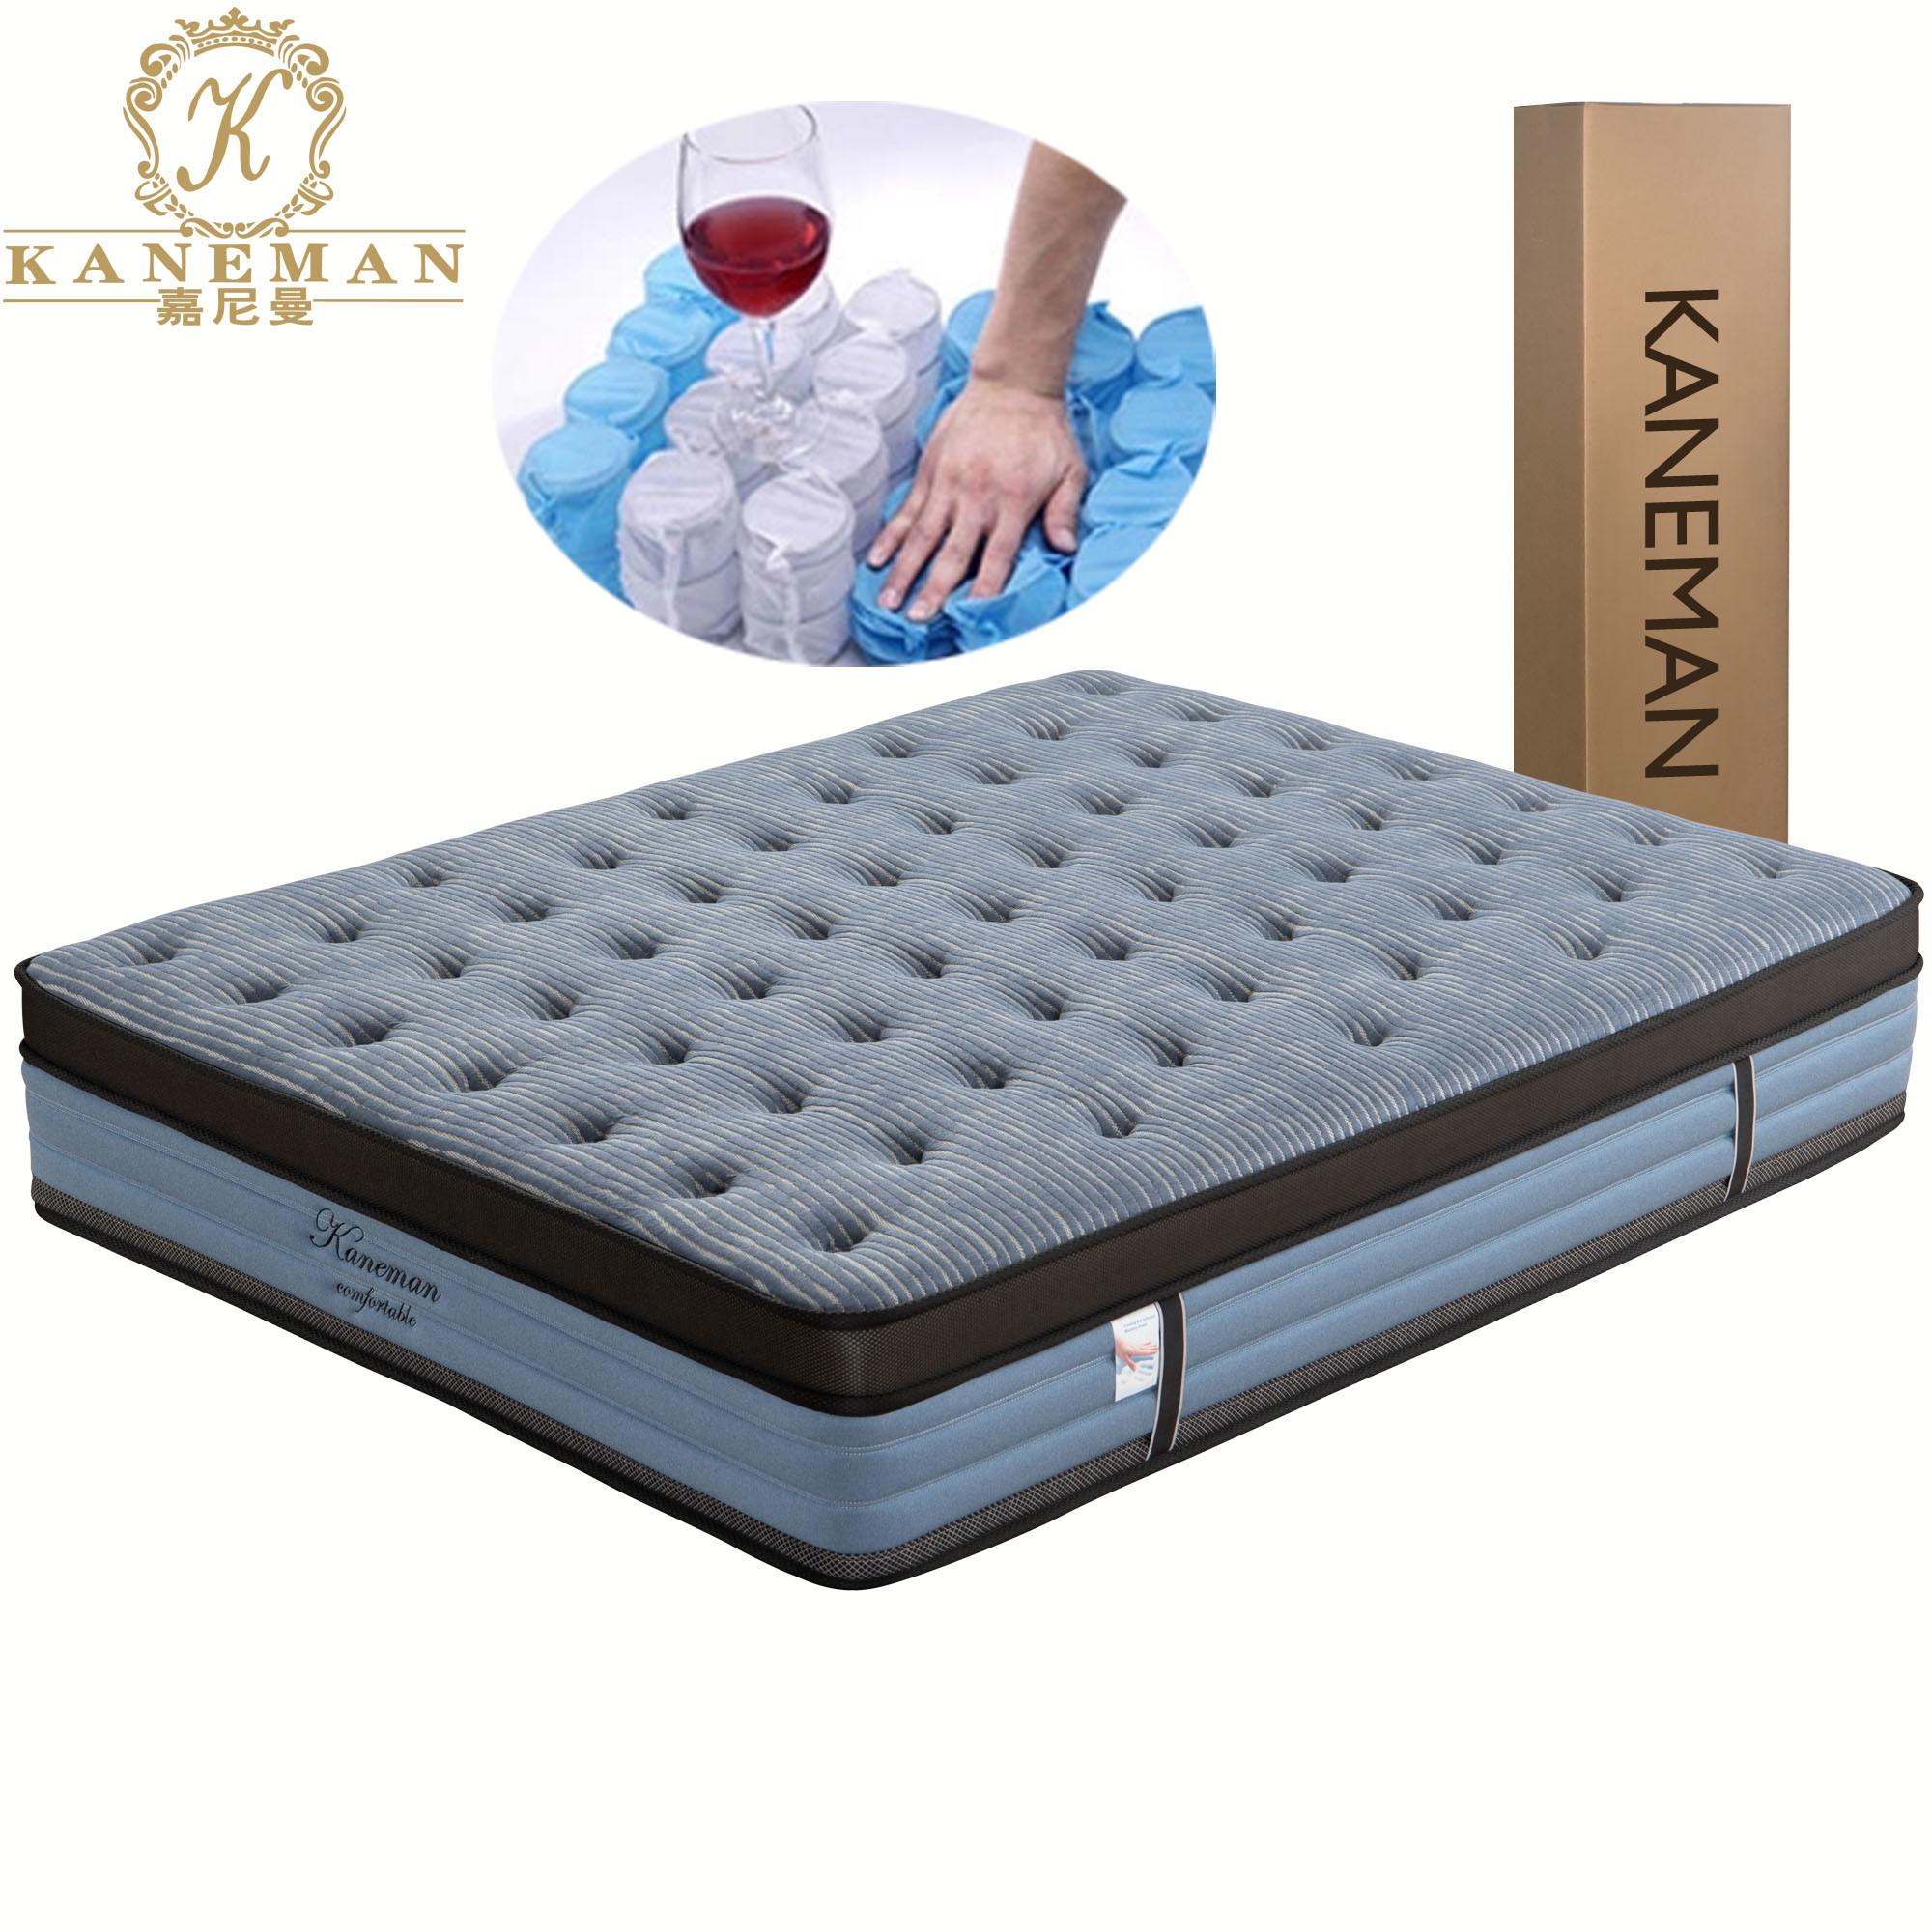 Queen Size Bed Mattress Roll Up Latex